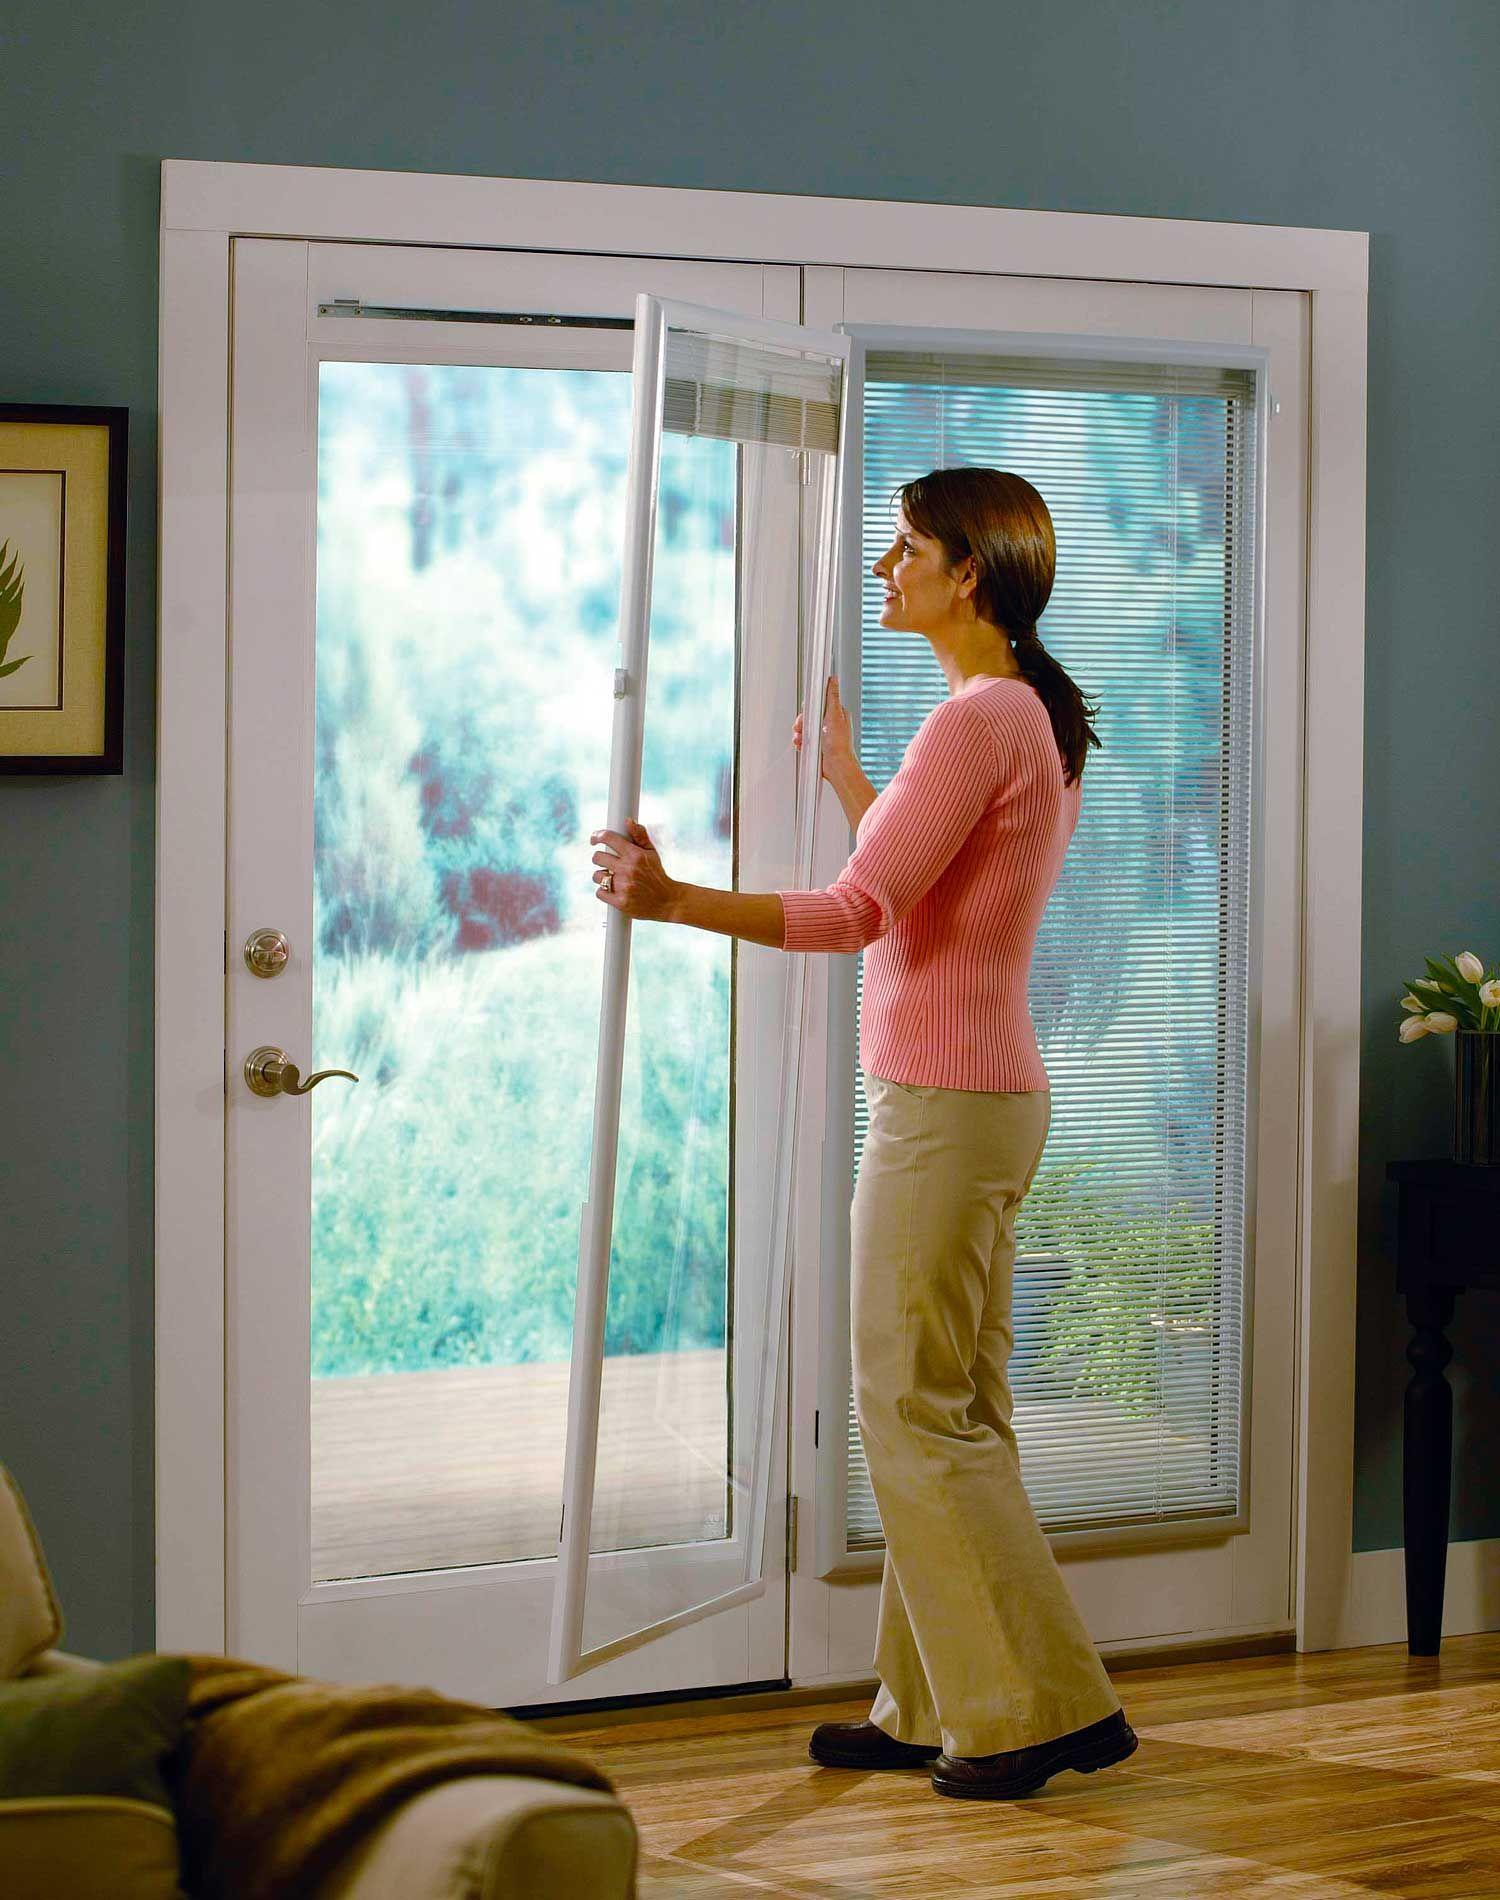 Window coverings for sliding doors  odl addon blinds for doors  flush frame  curtains for lounge